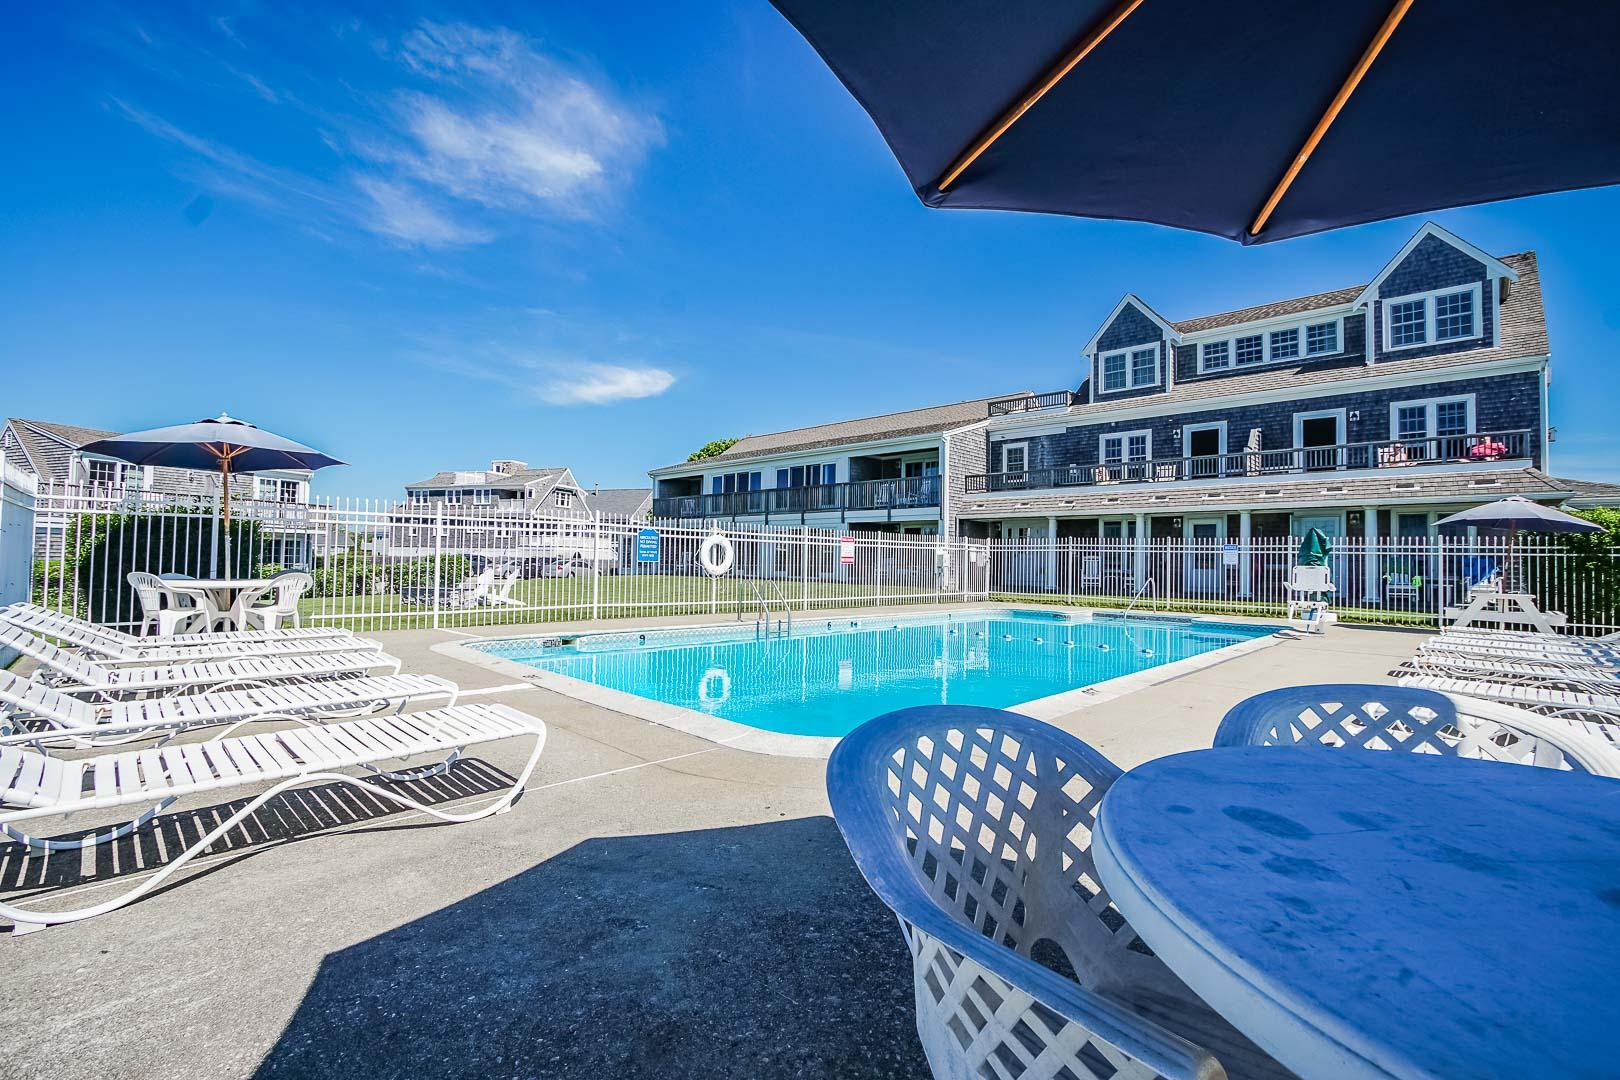 A refreshing pool at VRI's Beachside Village Resort in Massachusetts.